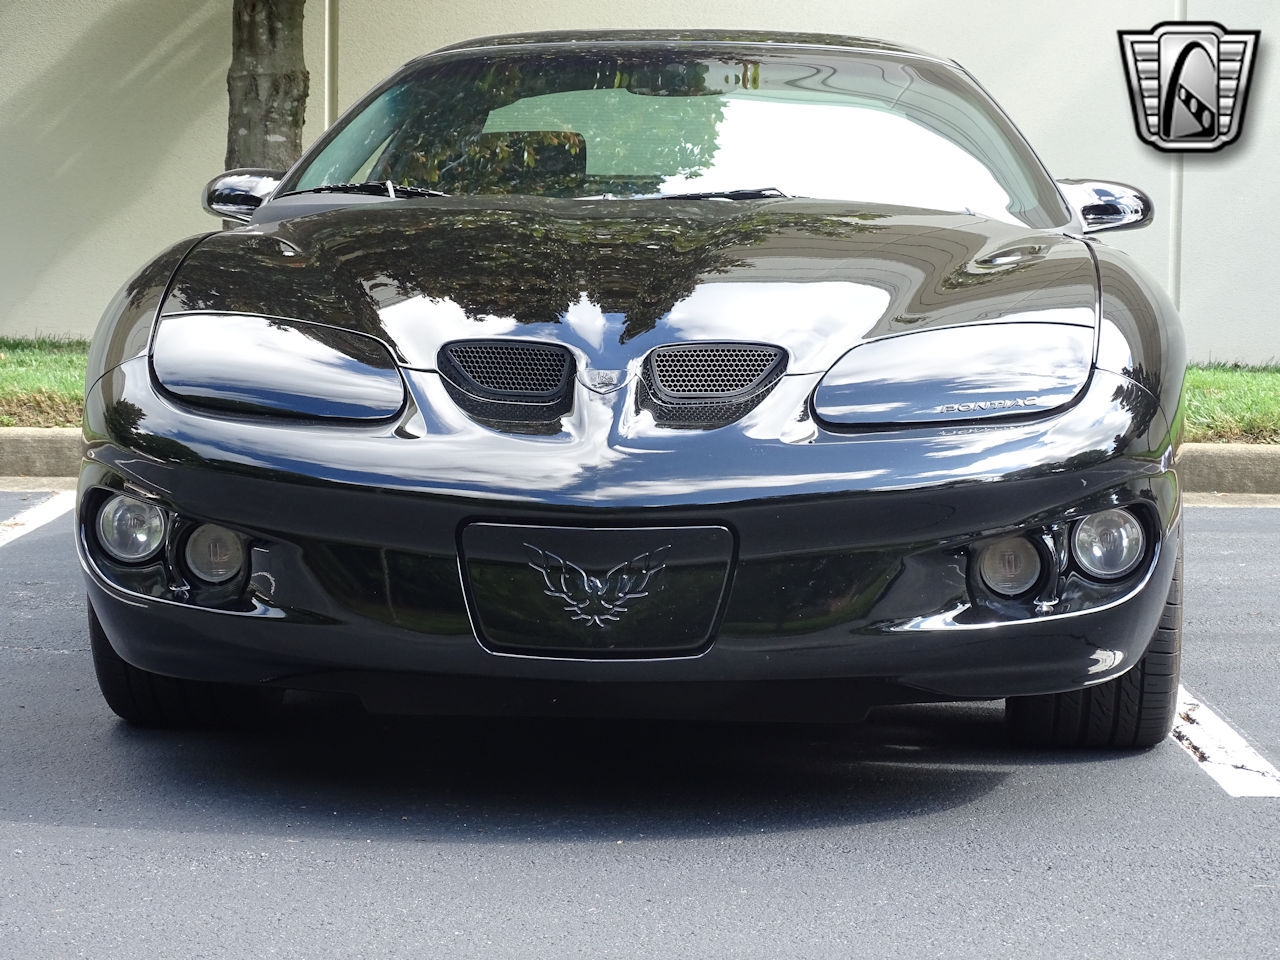 2001 Pontiac Firebird 2